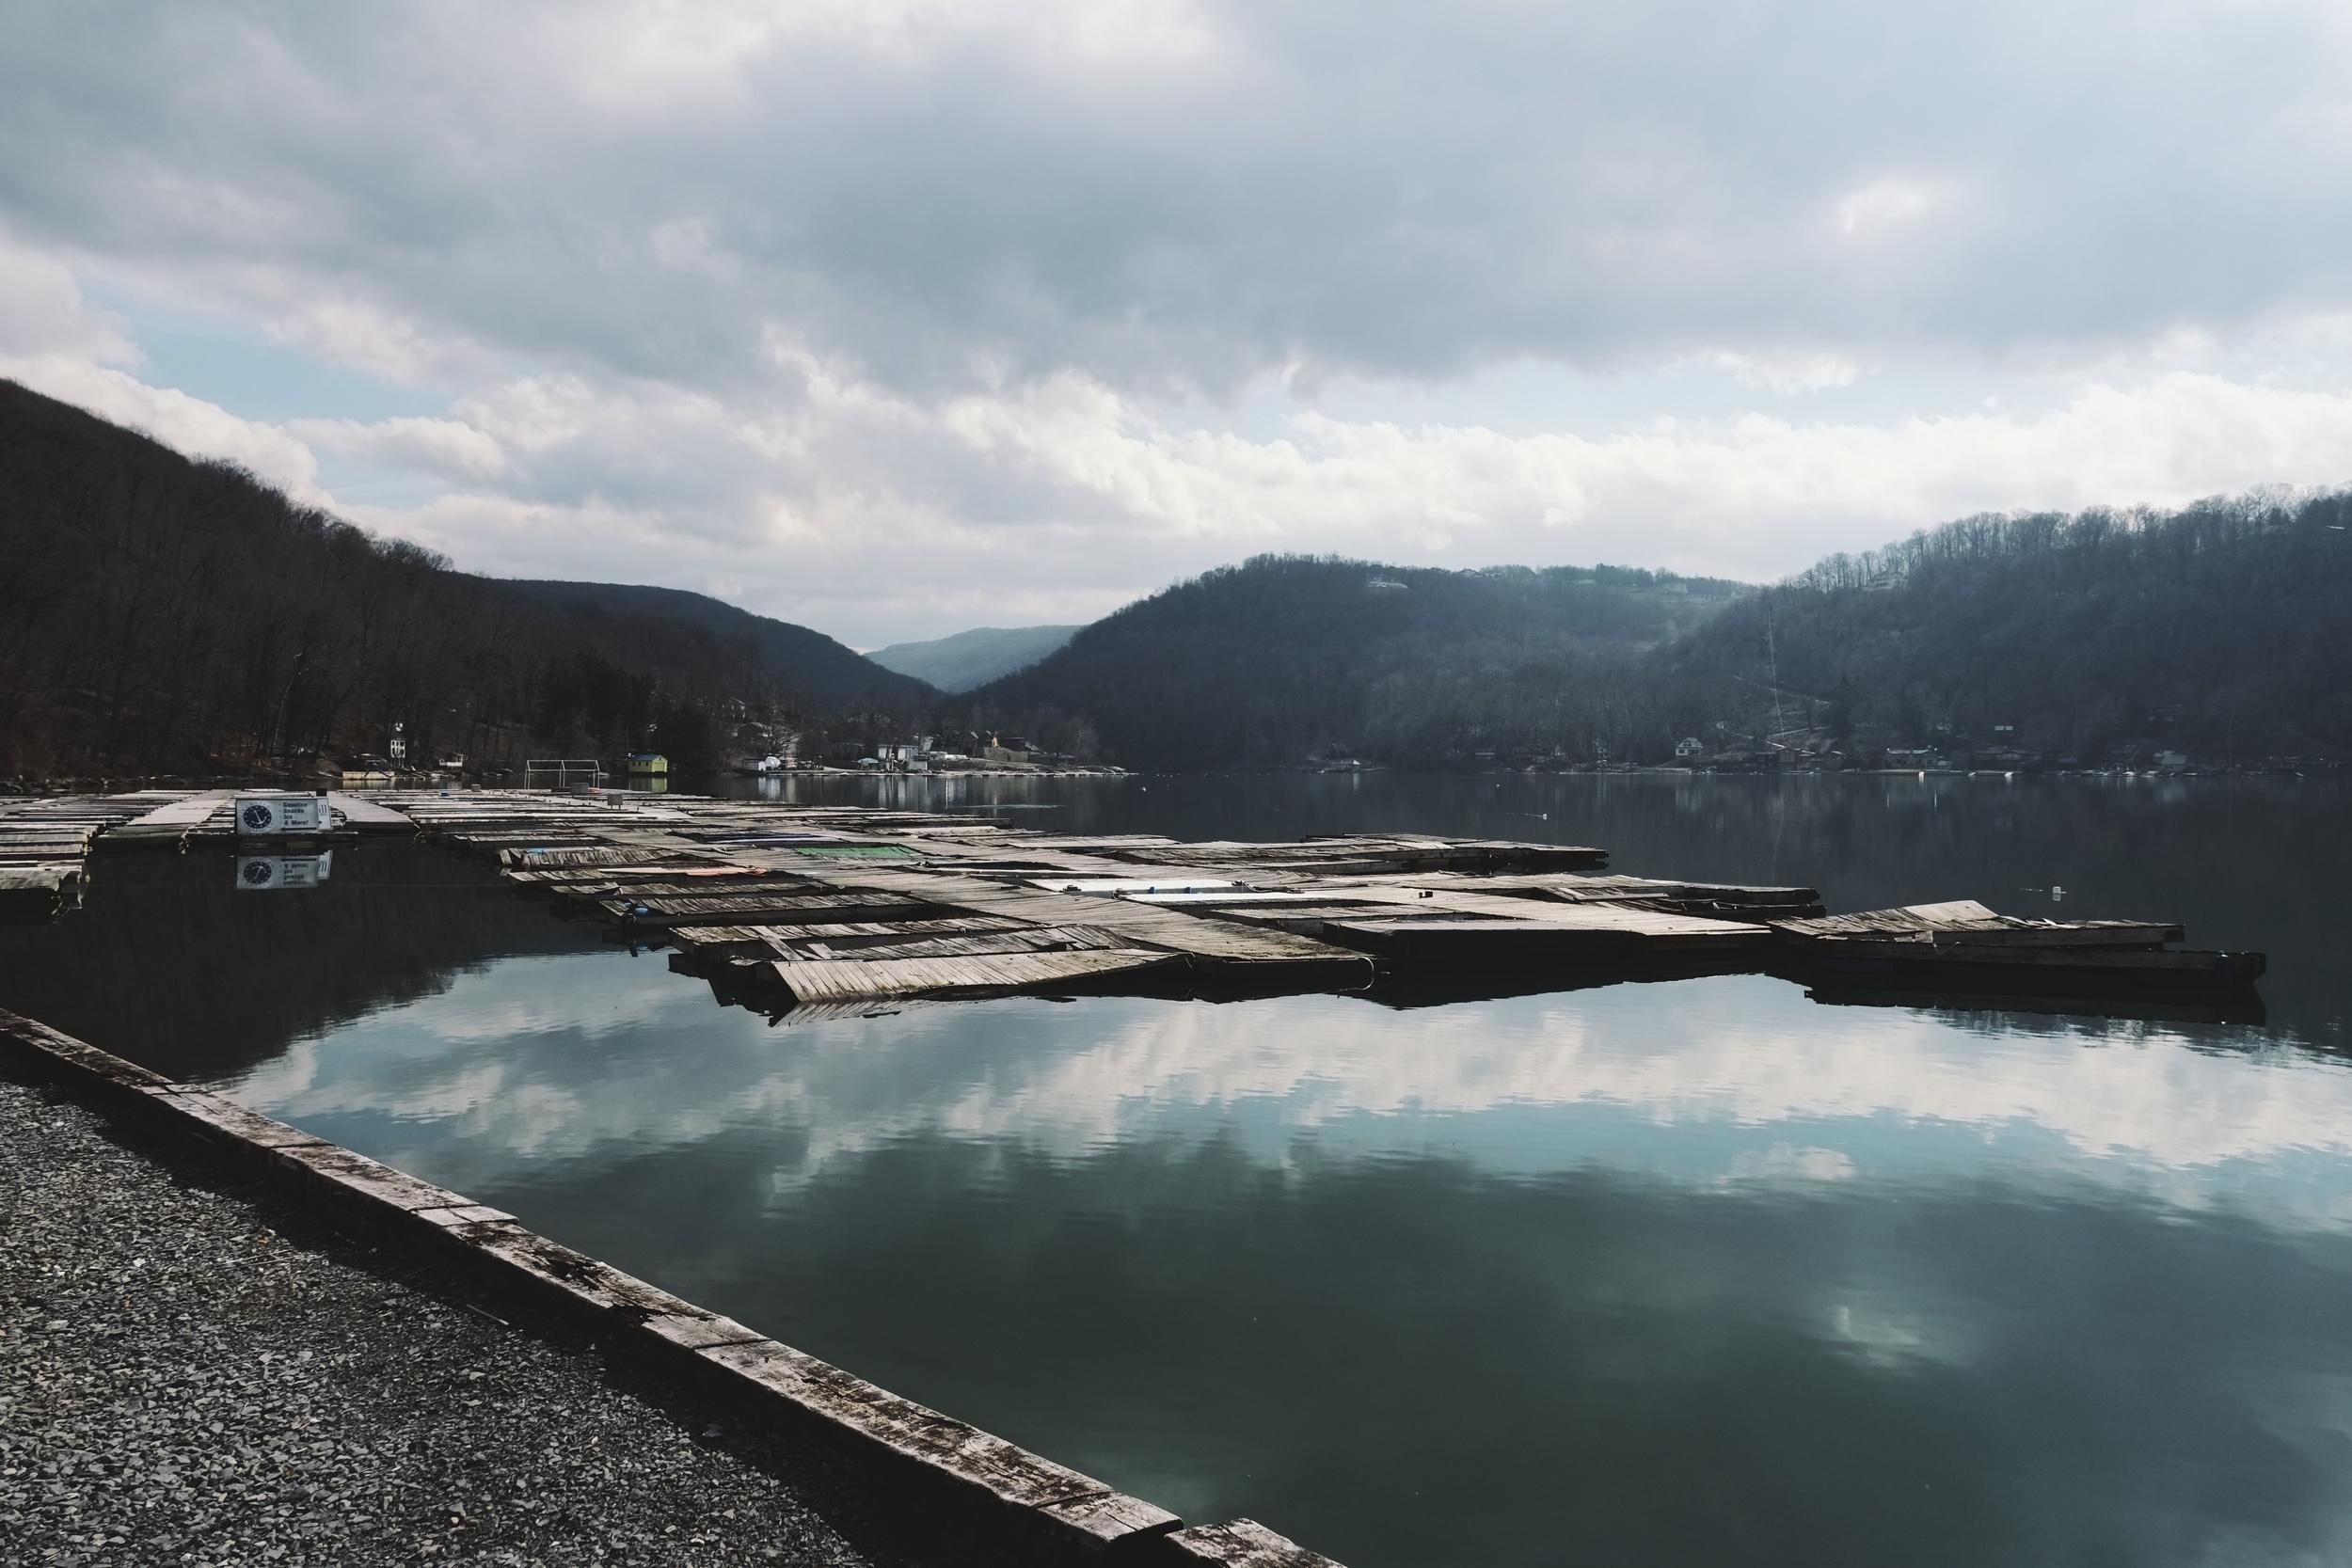 Off season boat docks.